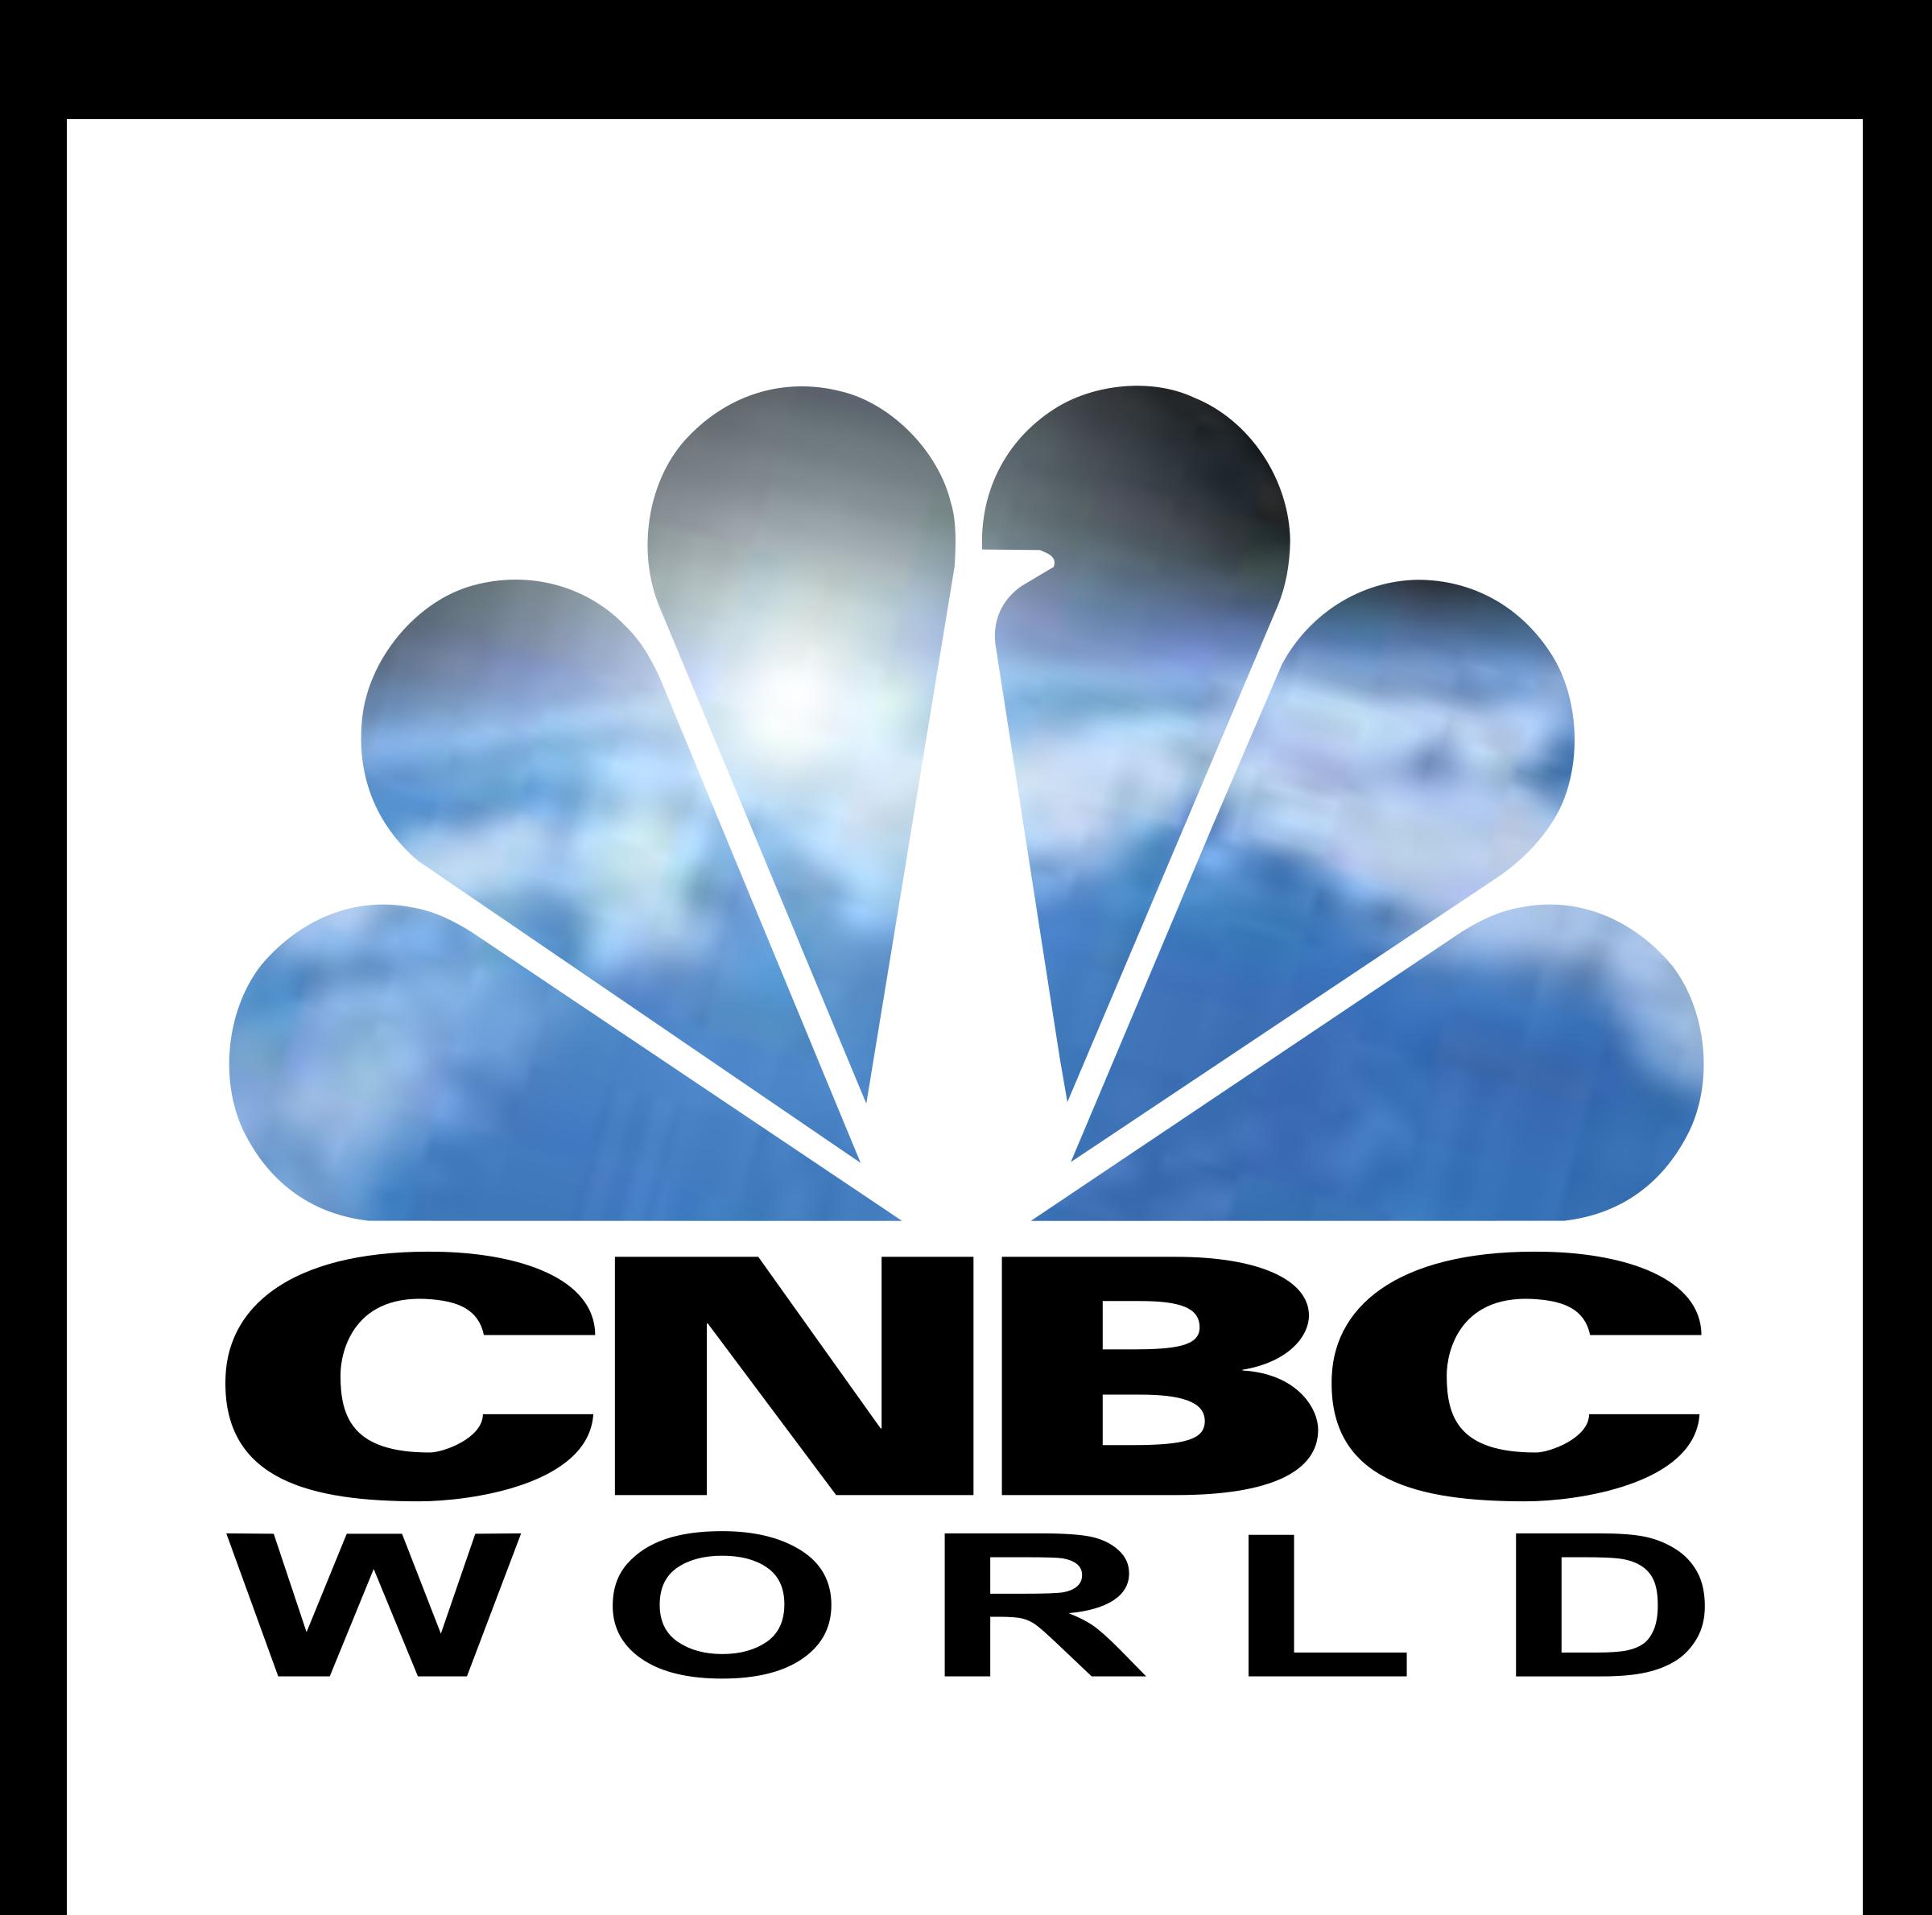 cnbc world logo png transparent & svg vector - freebie supply, Cnbc Presentation Template, Presentation templates